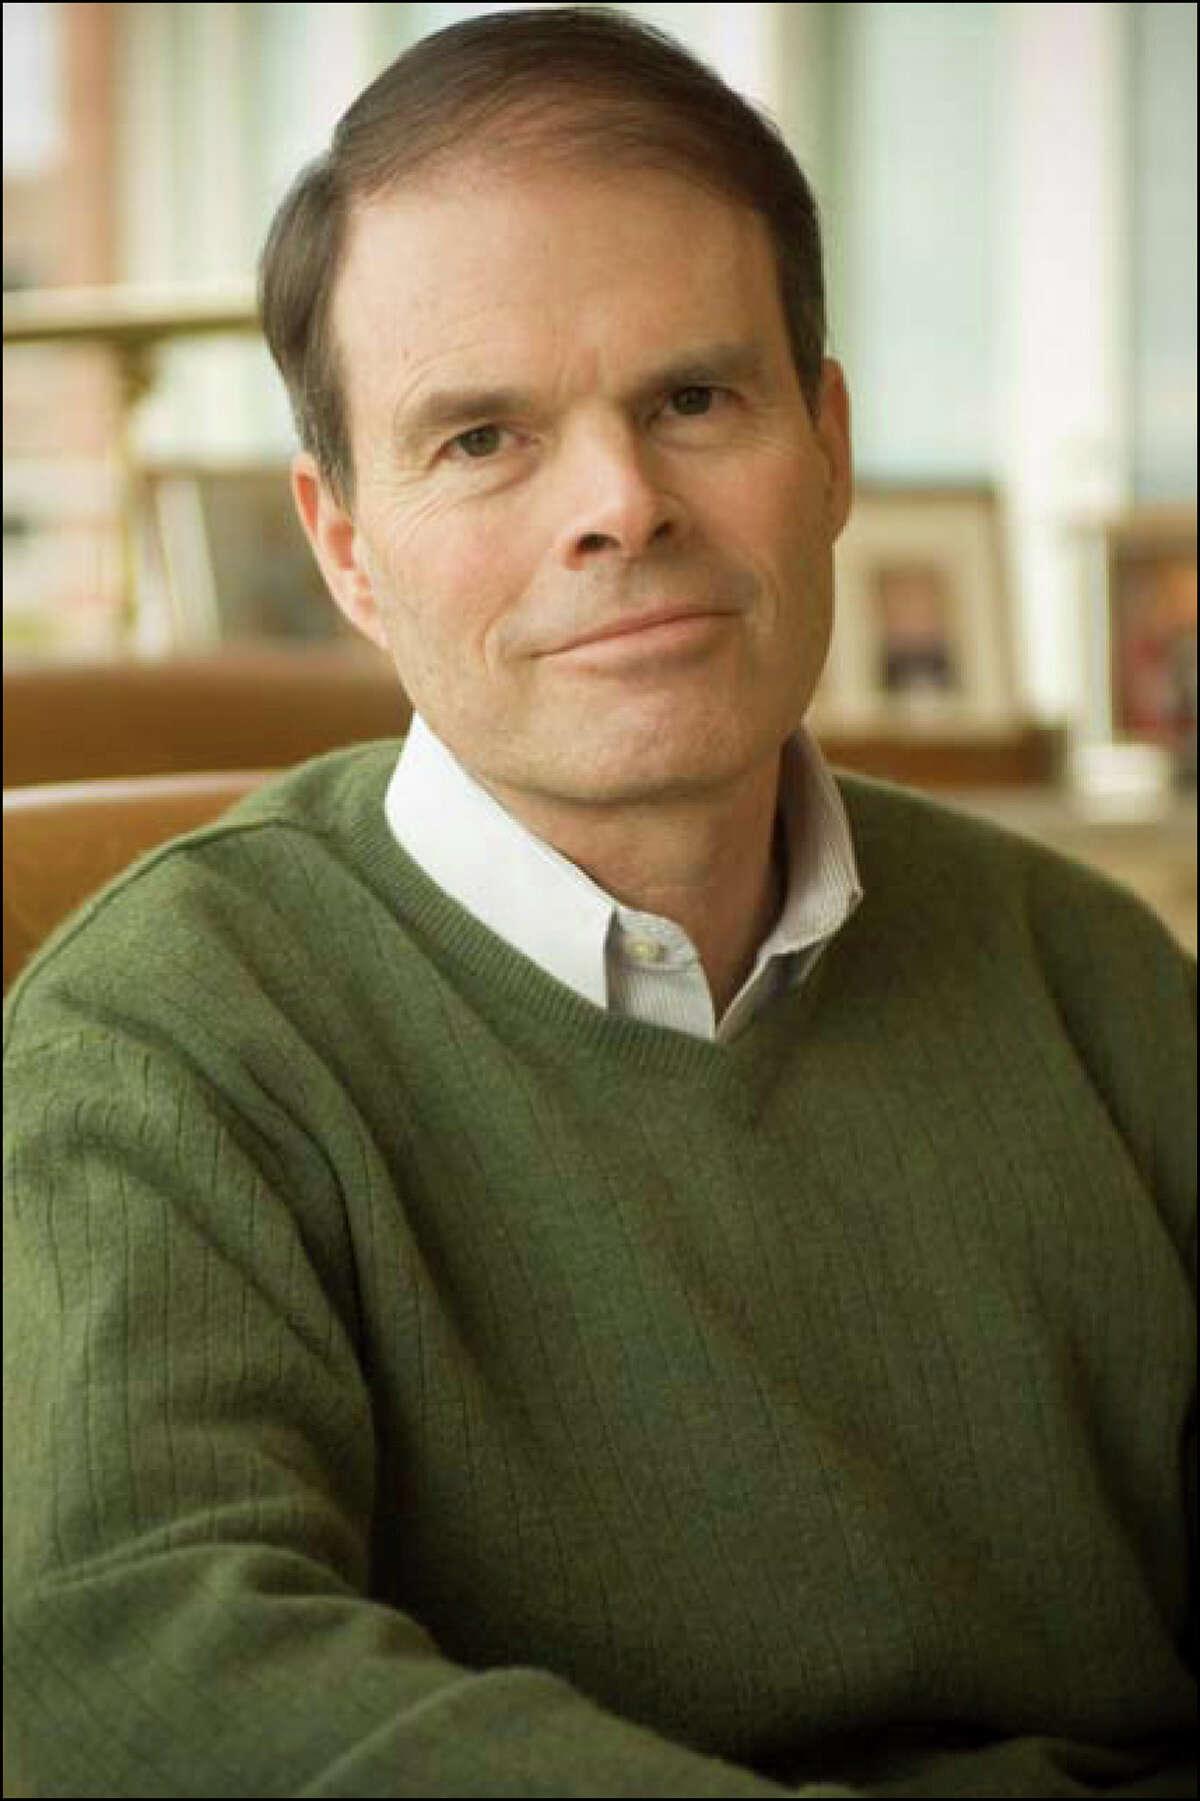 10. Craig McCaw Net worth: $1.75 billion Founder of McCaw Cellular and Clearwire.